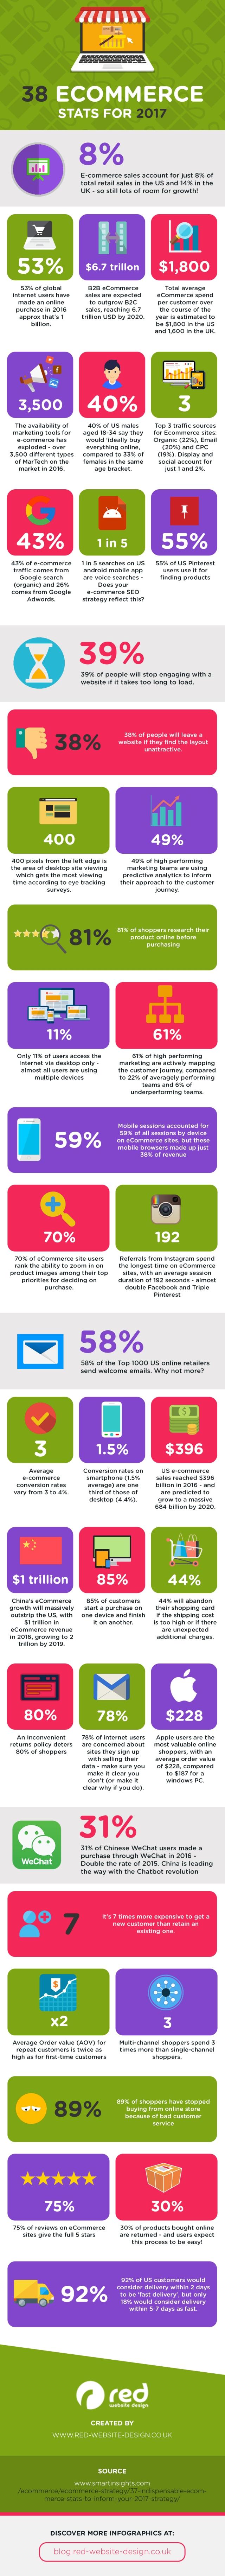 ecommerce trends info